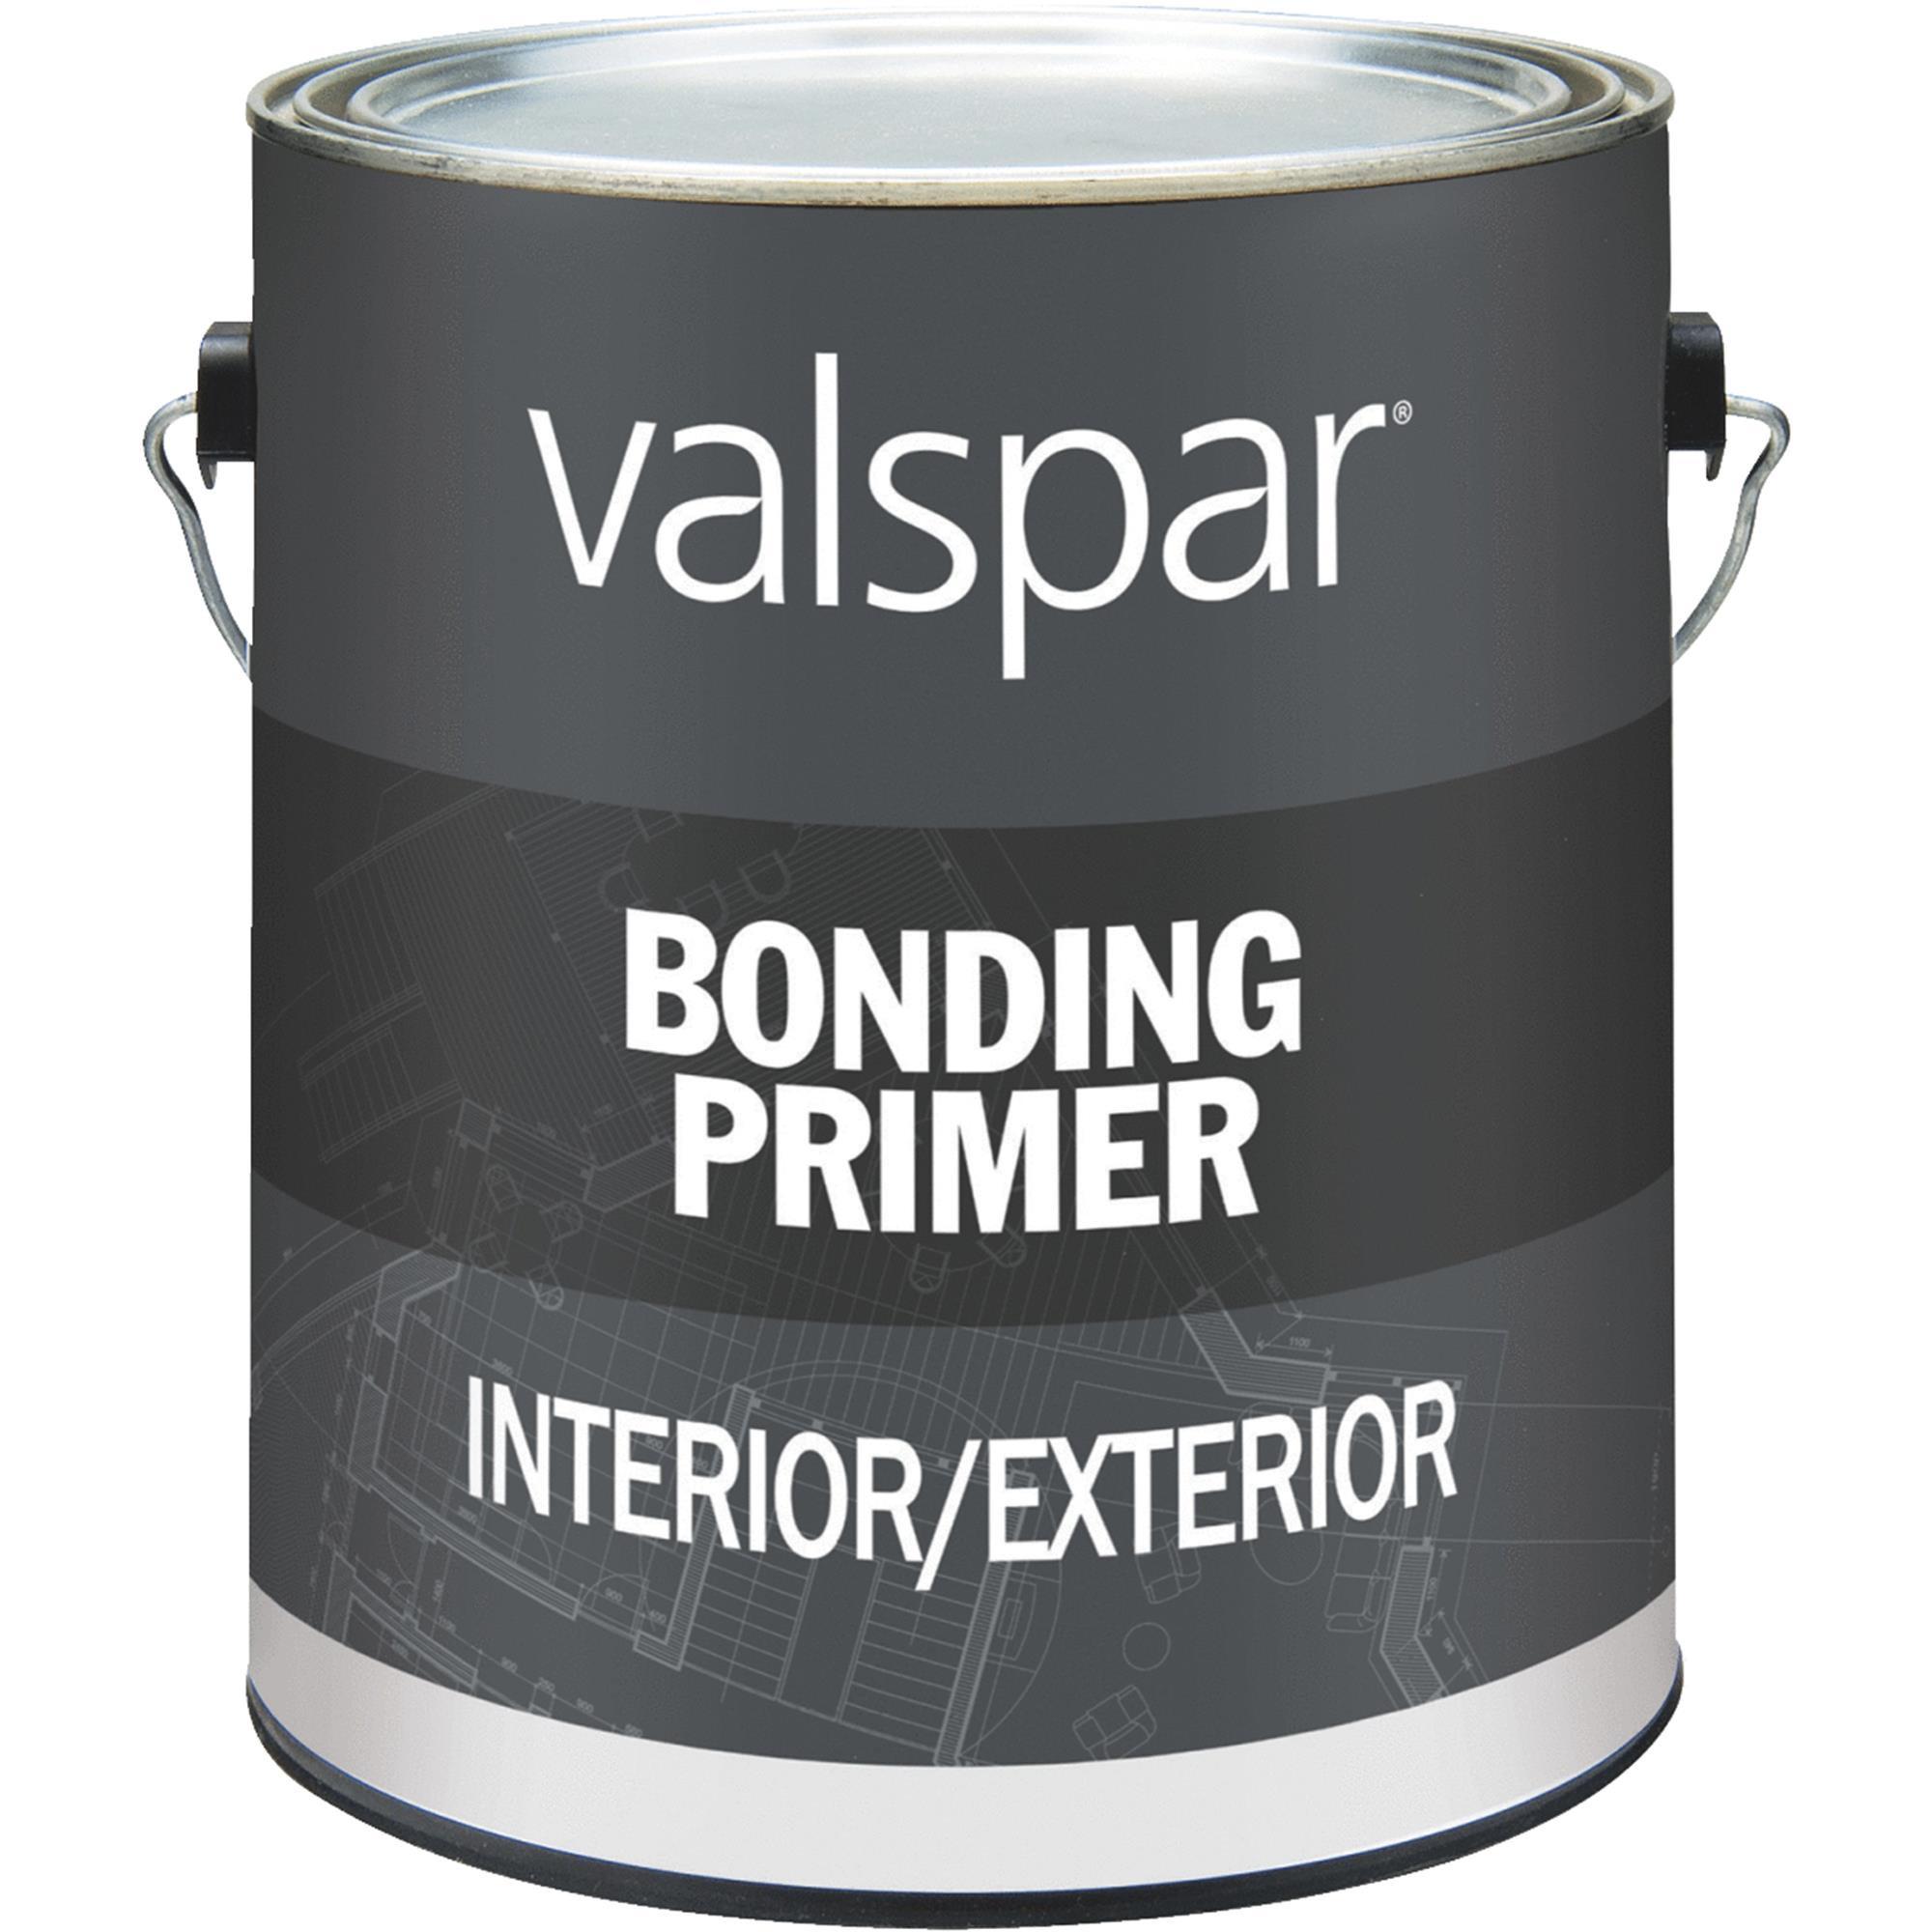 Valspar Interior/Exterior Stain Blocking Bonding Primer